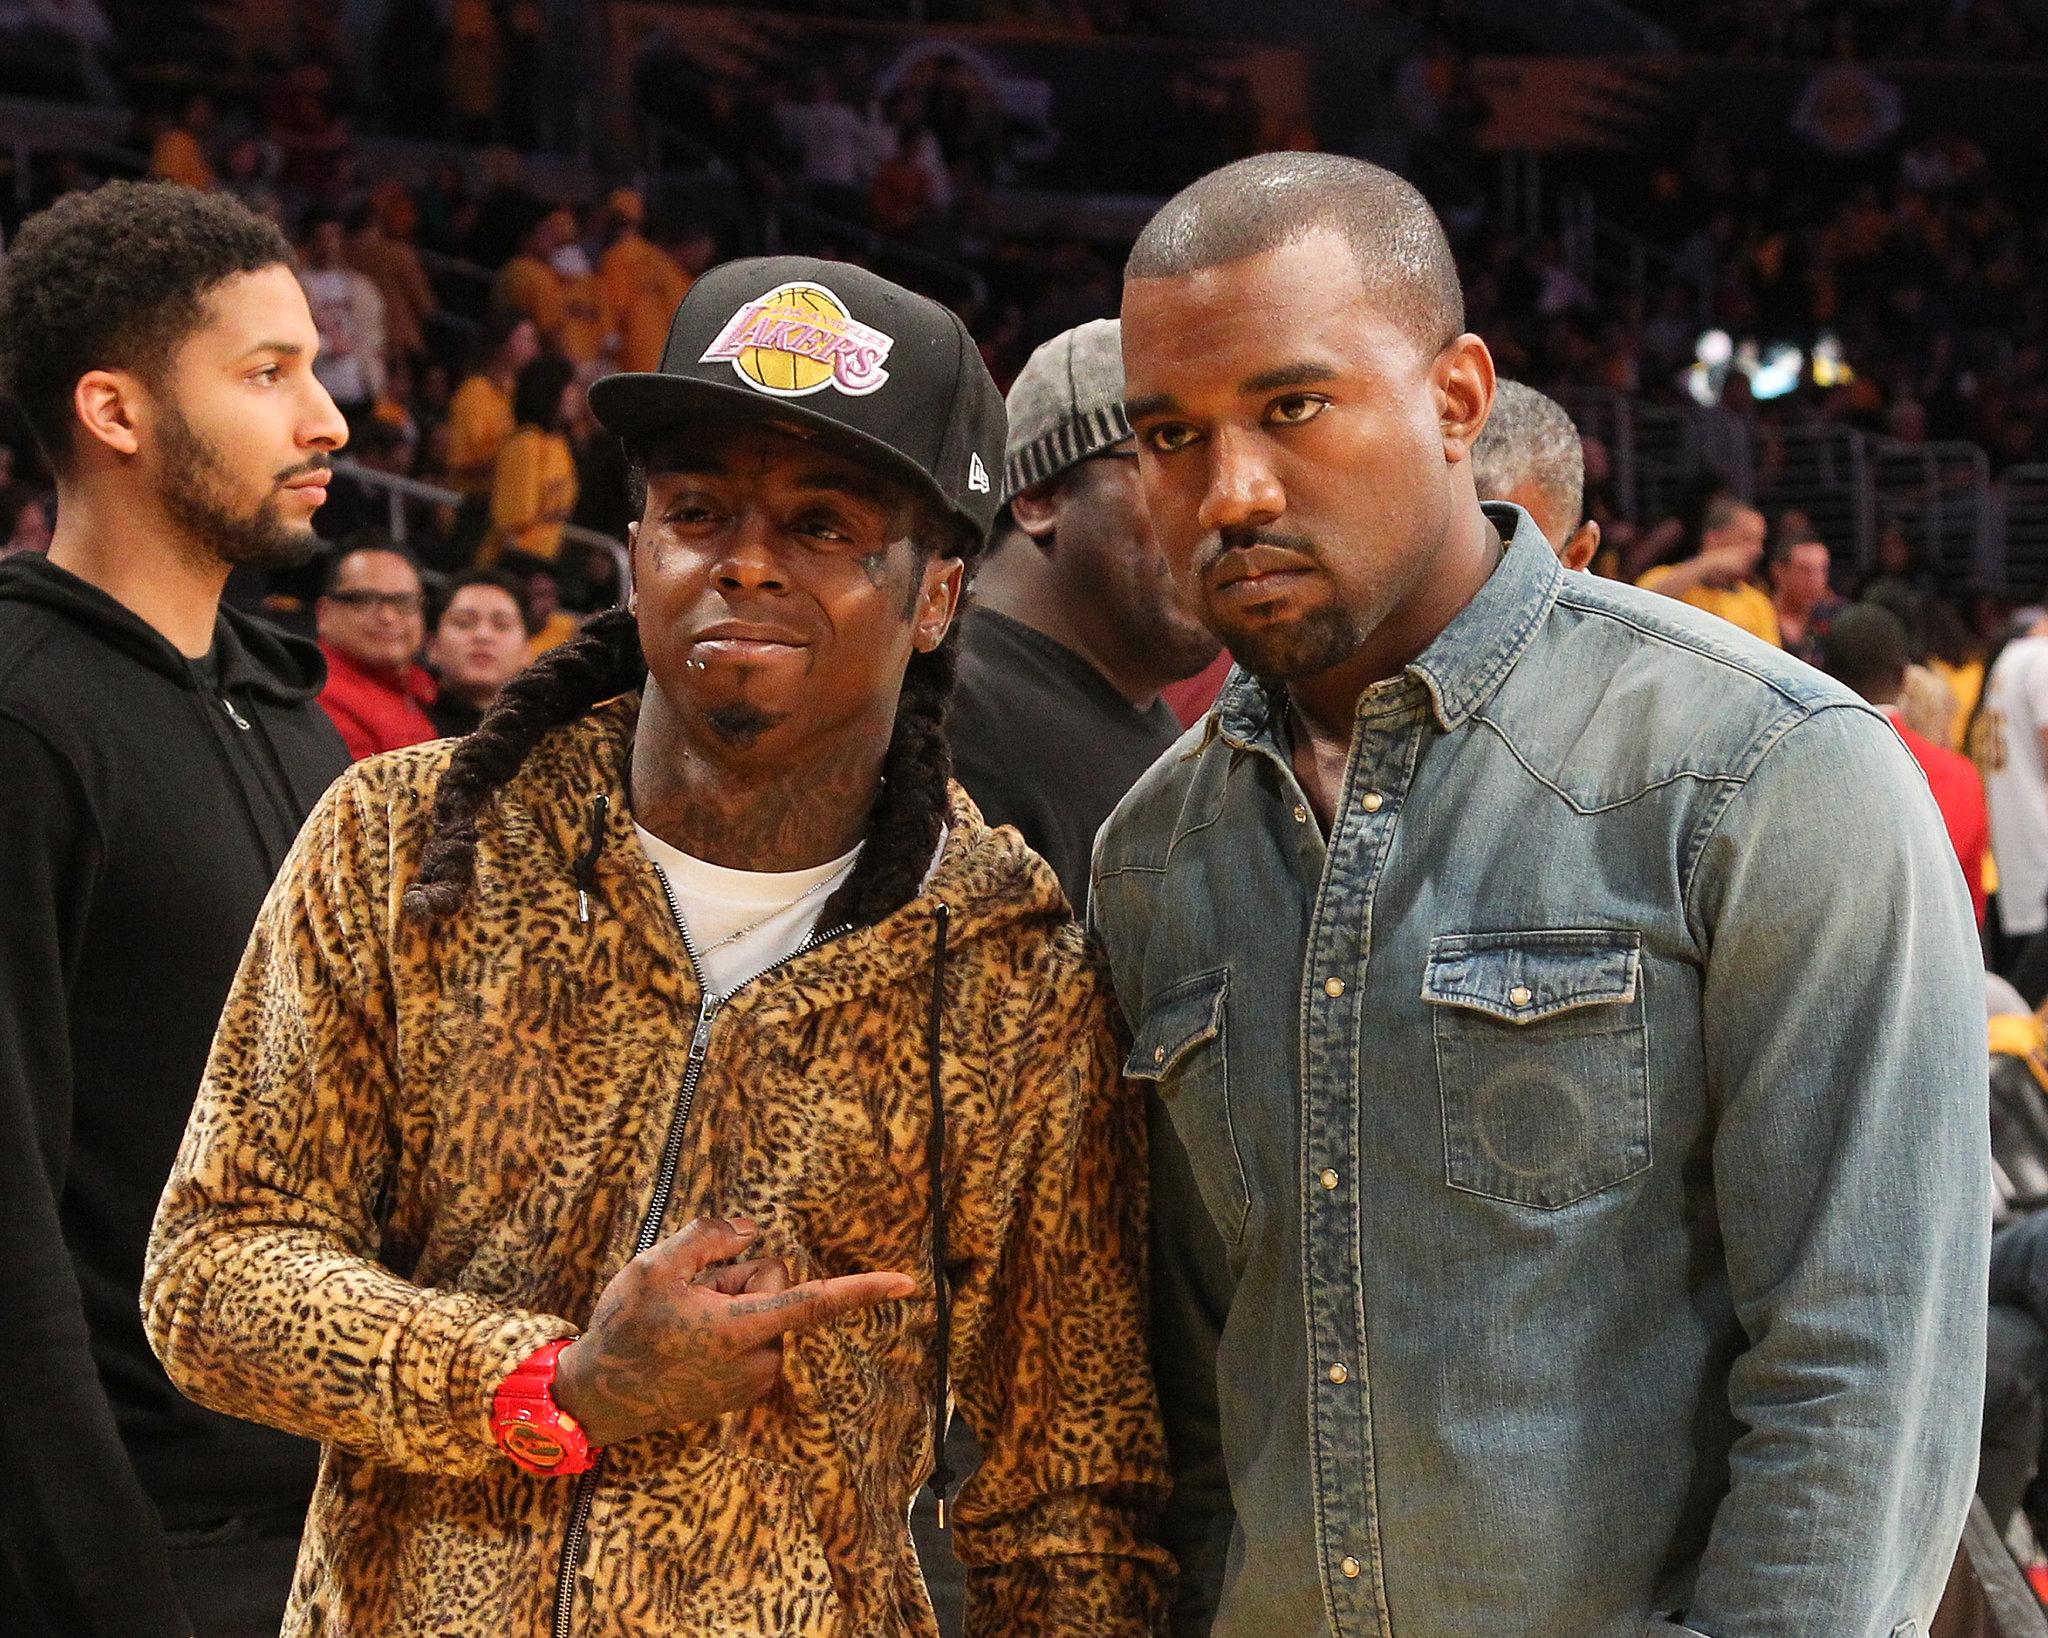 Lakers Game With Lil Wayne? Nah